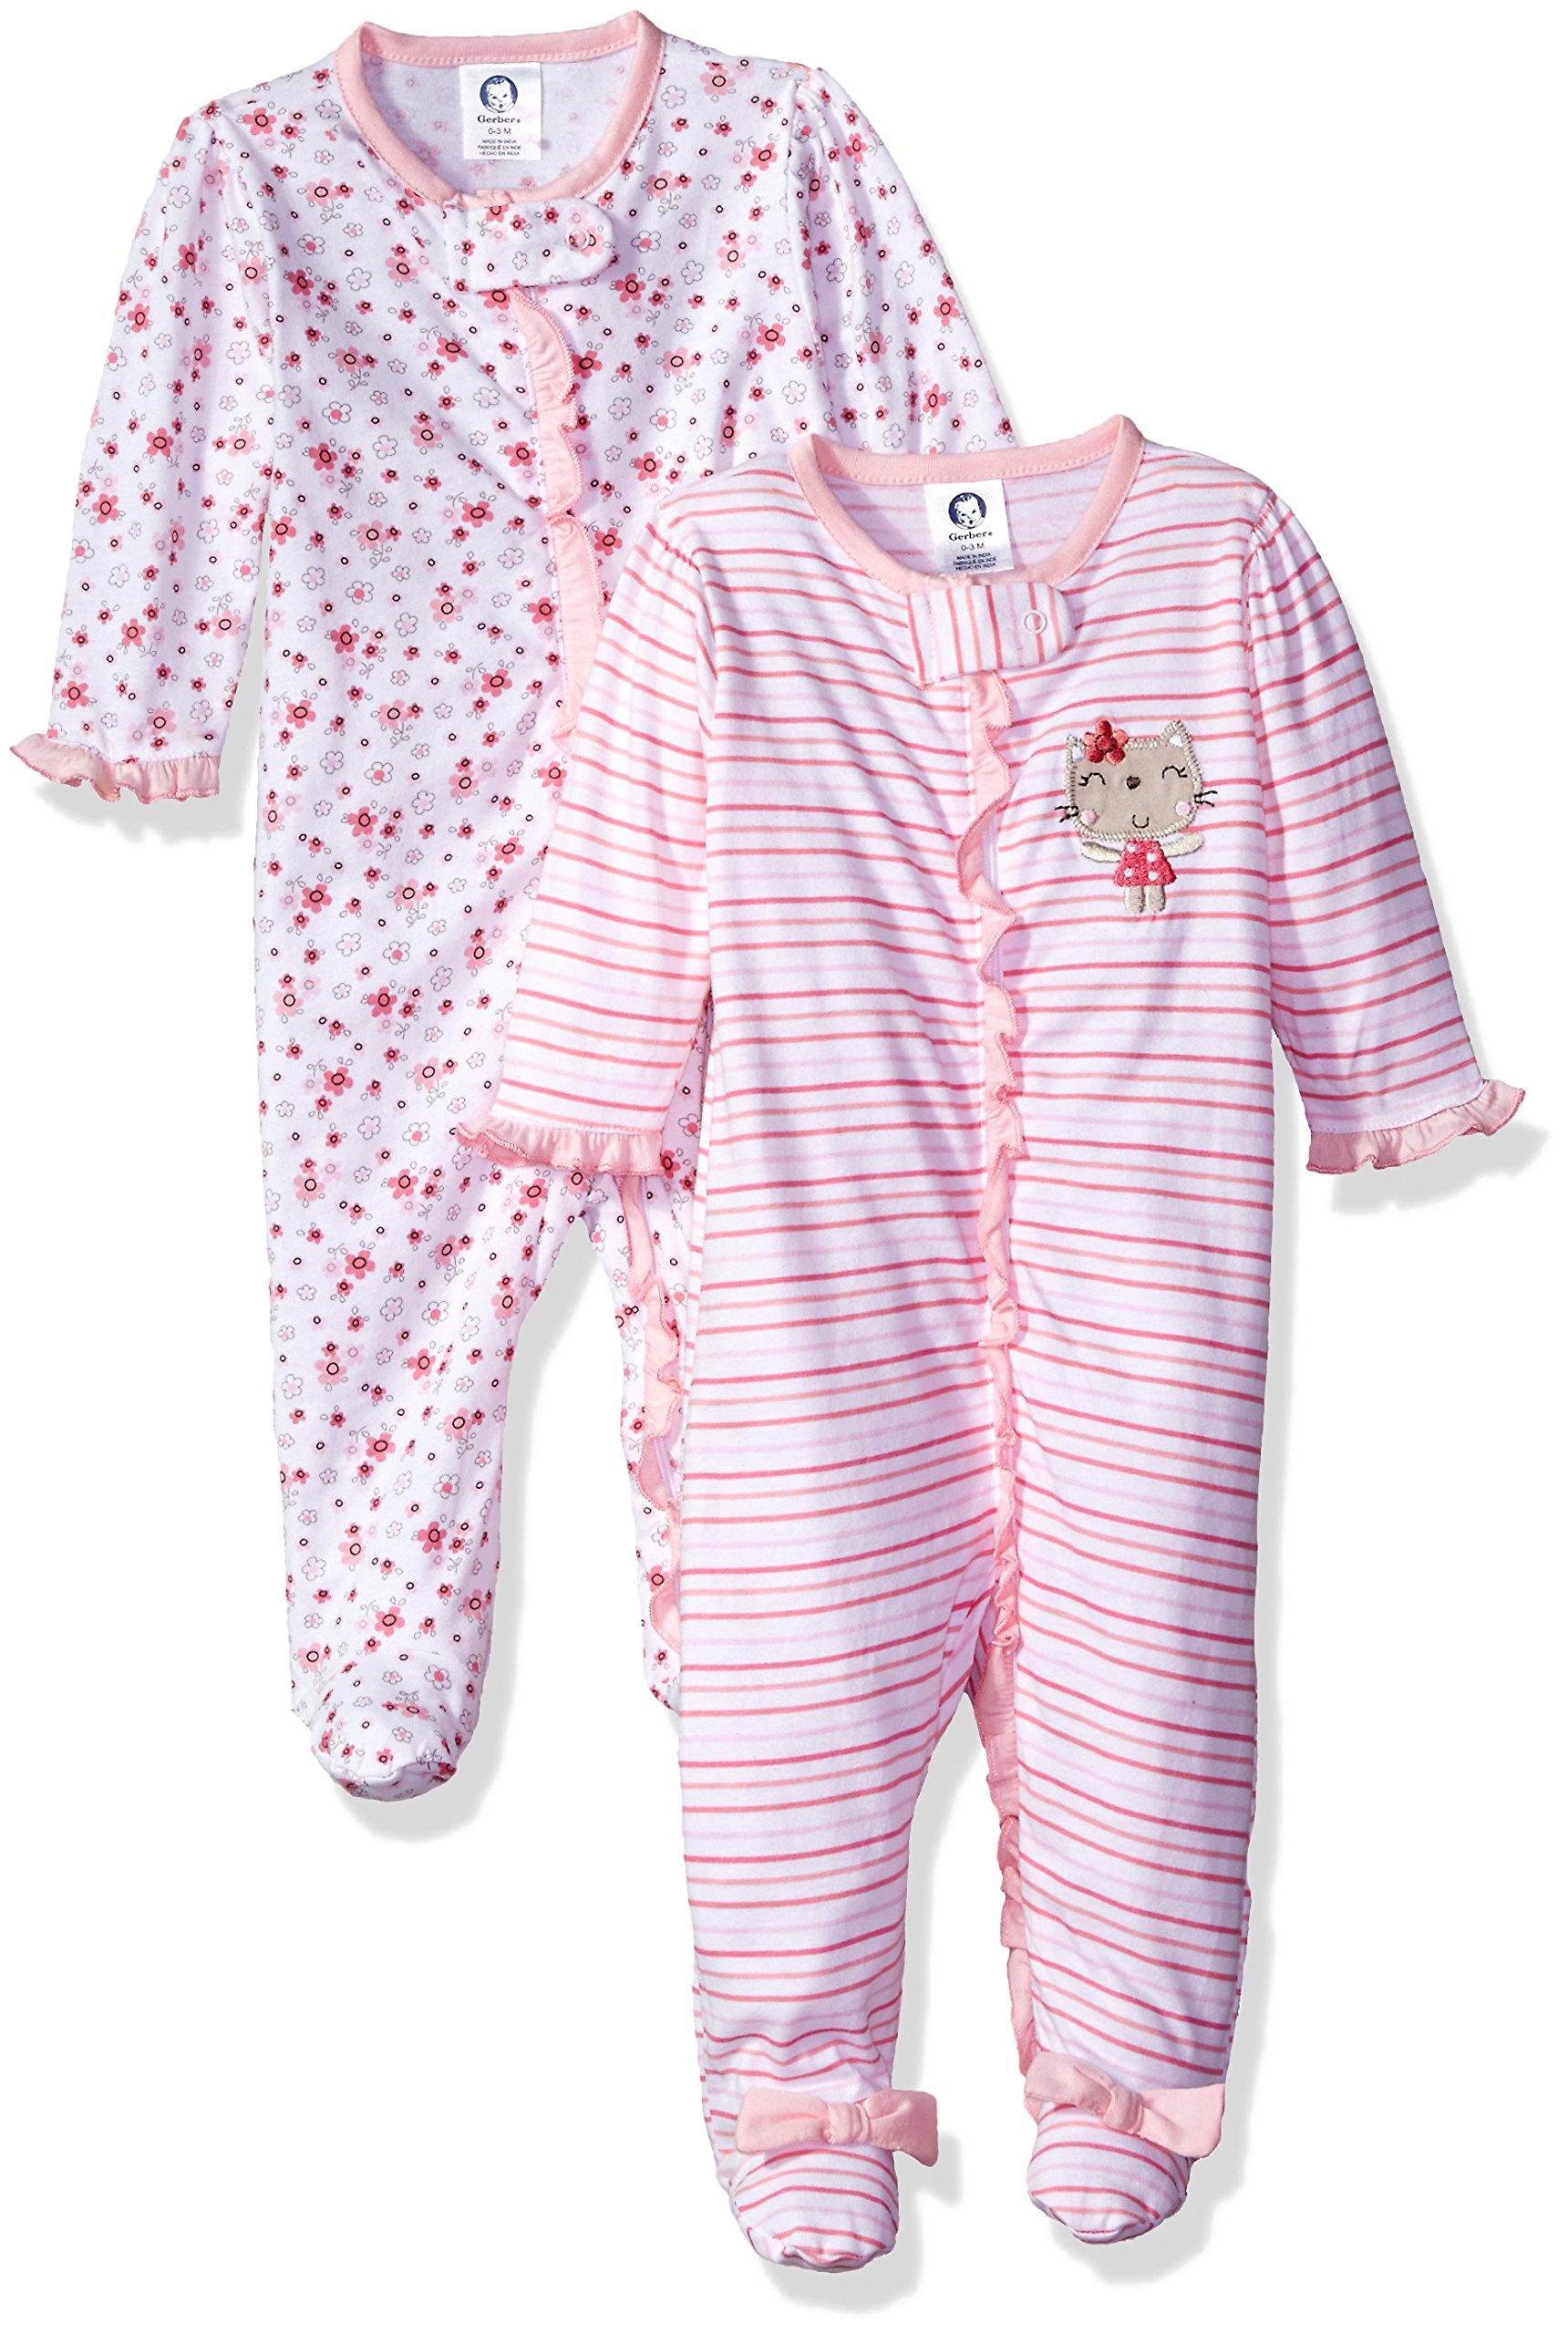 Gerber Baby Girls 2 Pack Zip Front Sleep  n Play e7524cb03